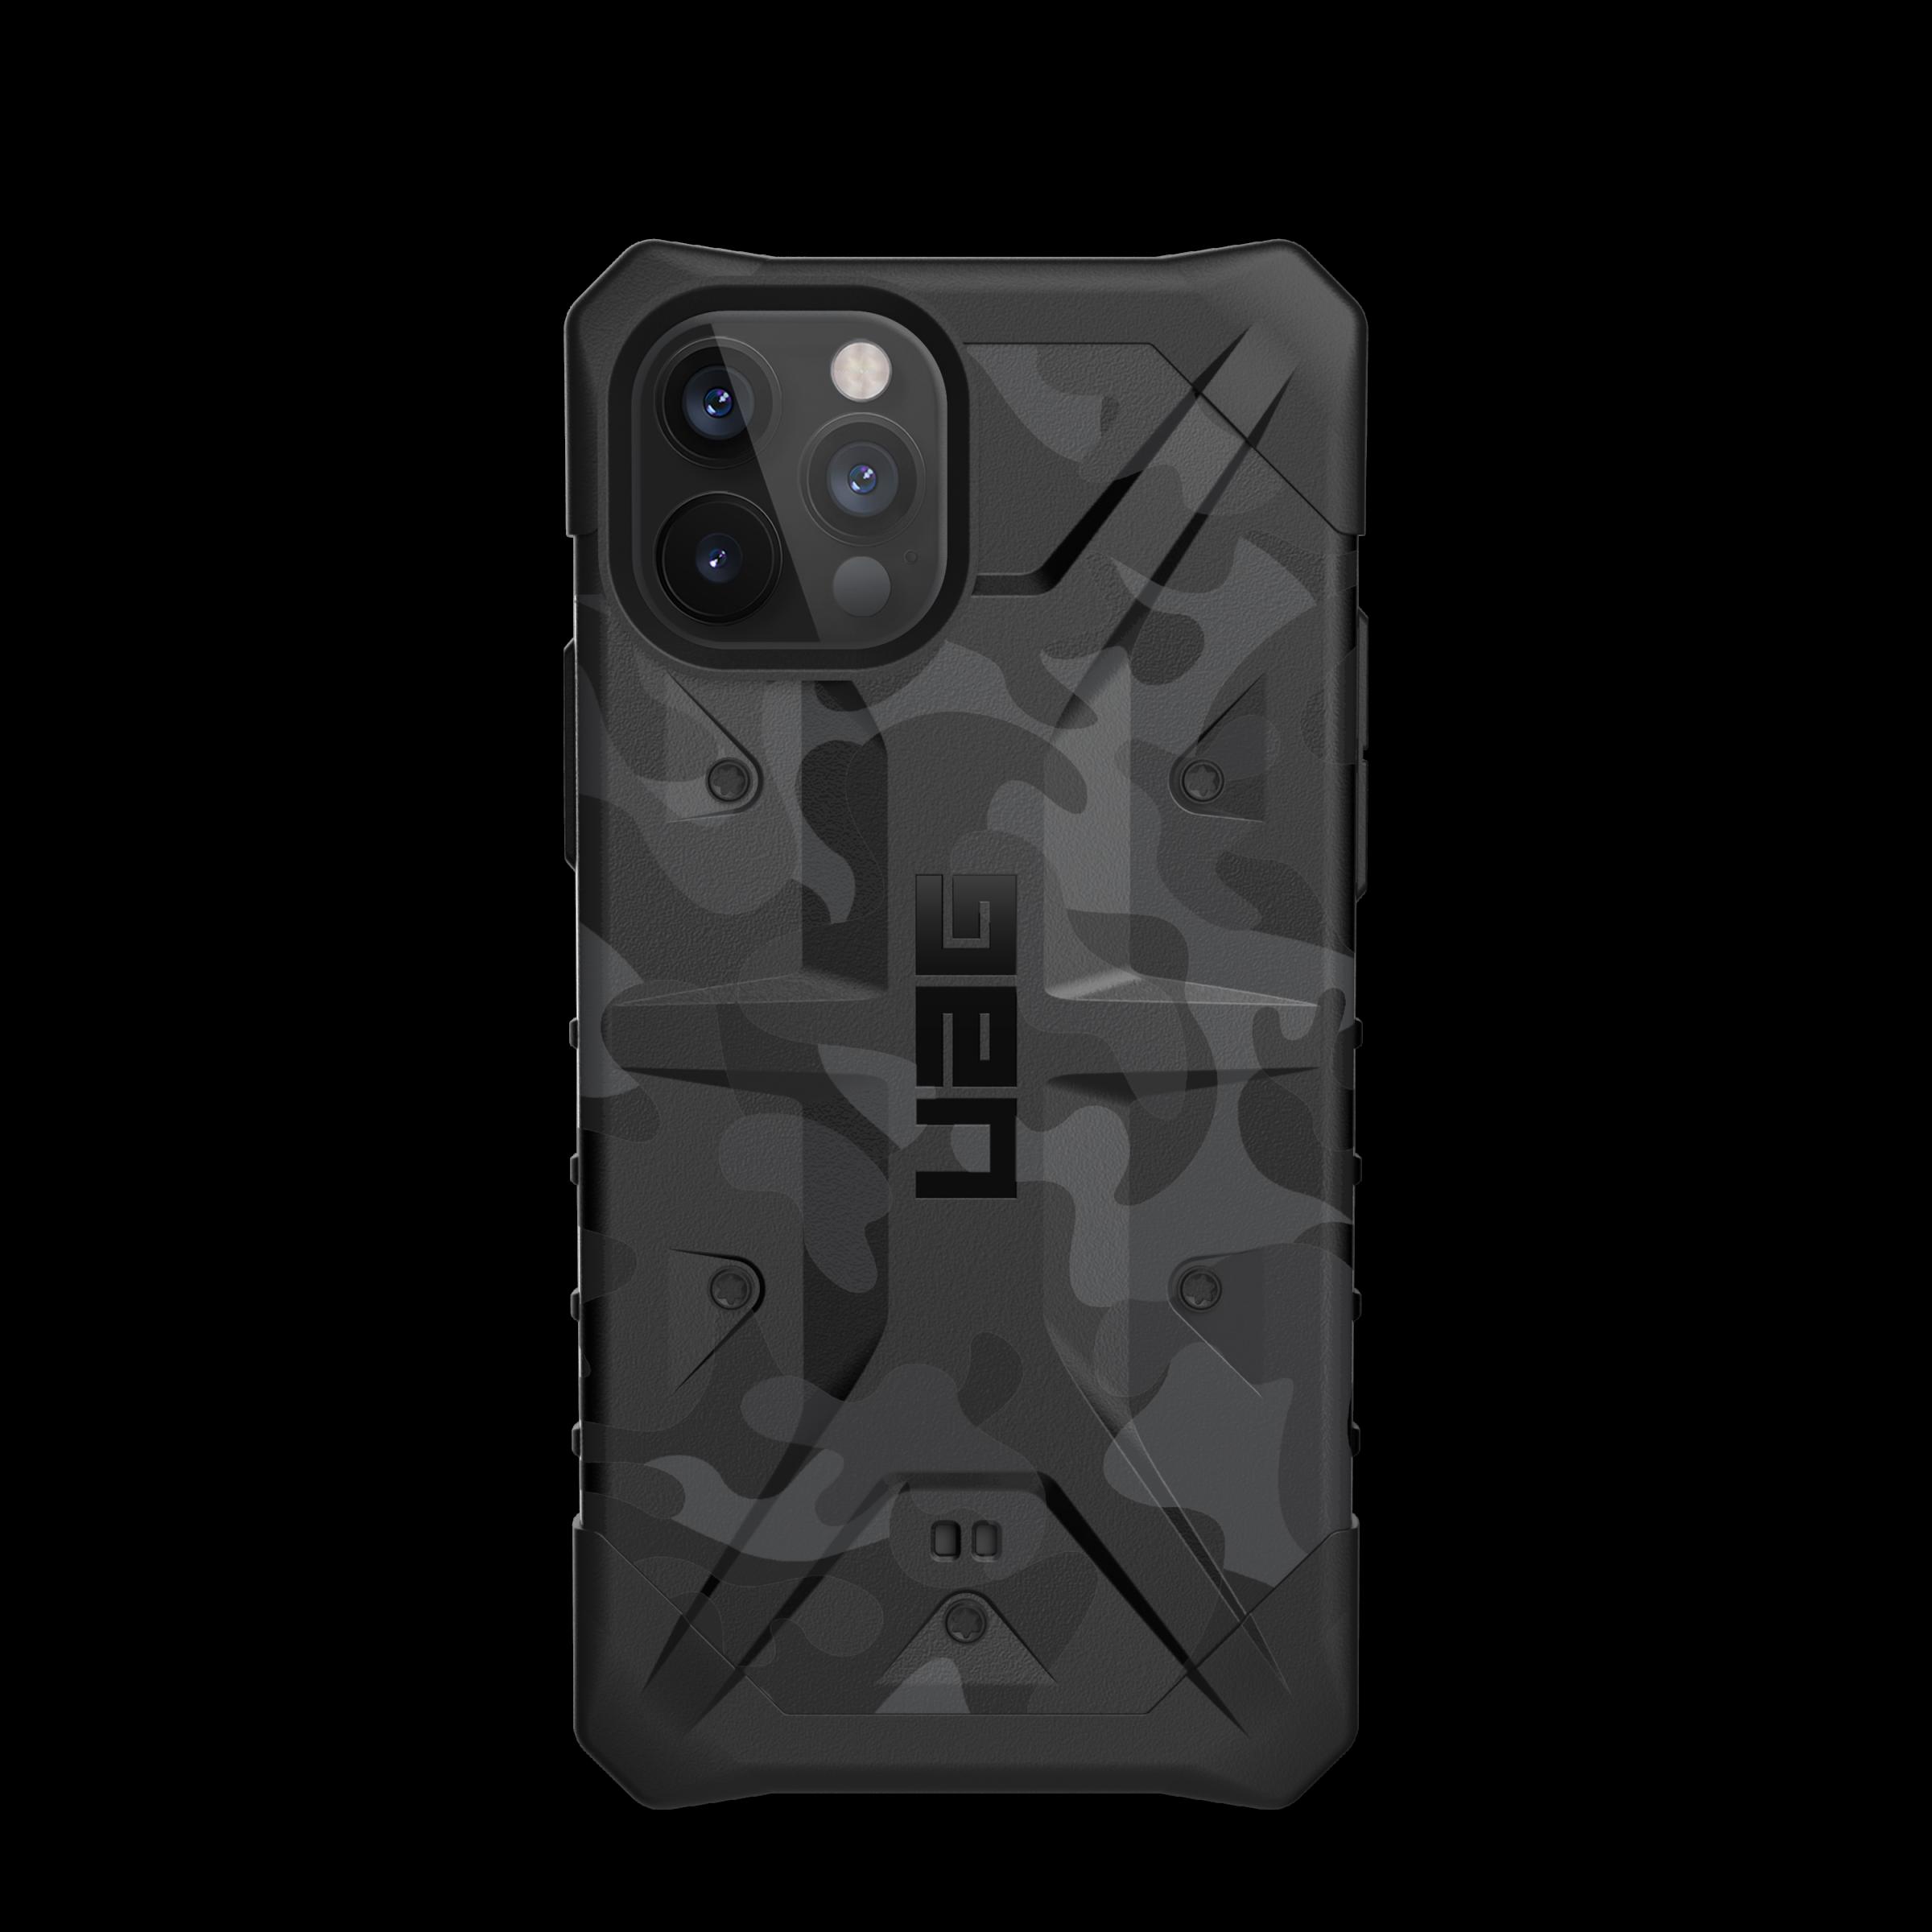 Pathfinder Series Case iPhone 12 Pro Max Black Midnight Camo